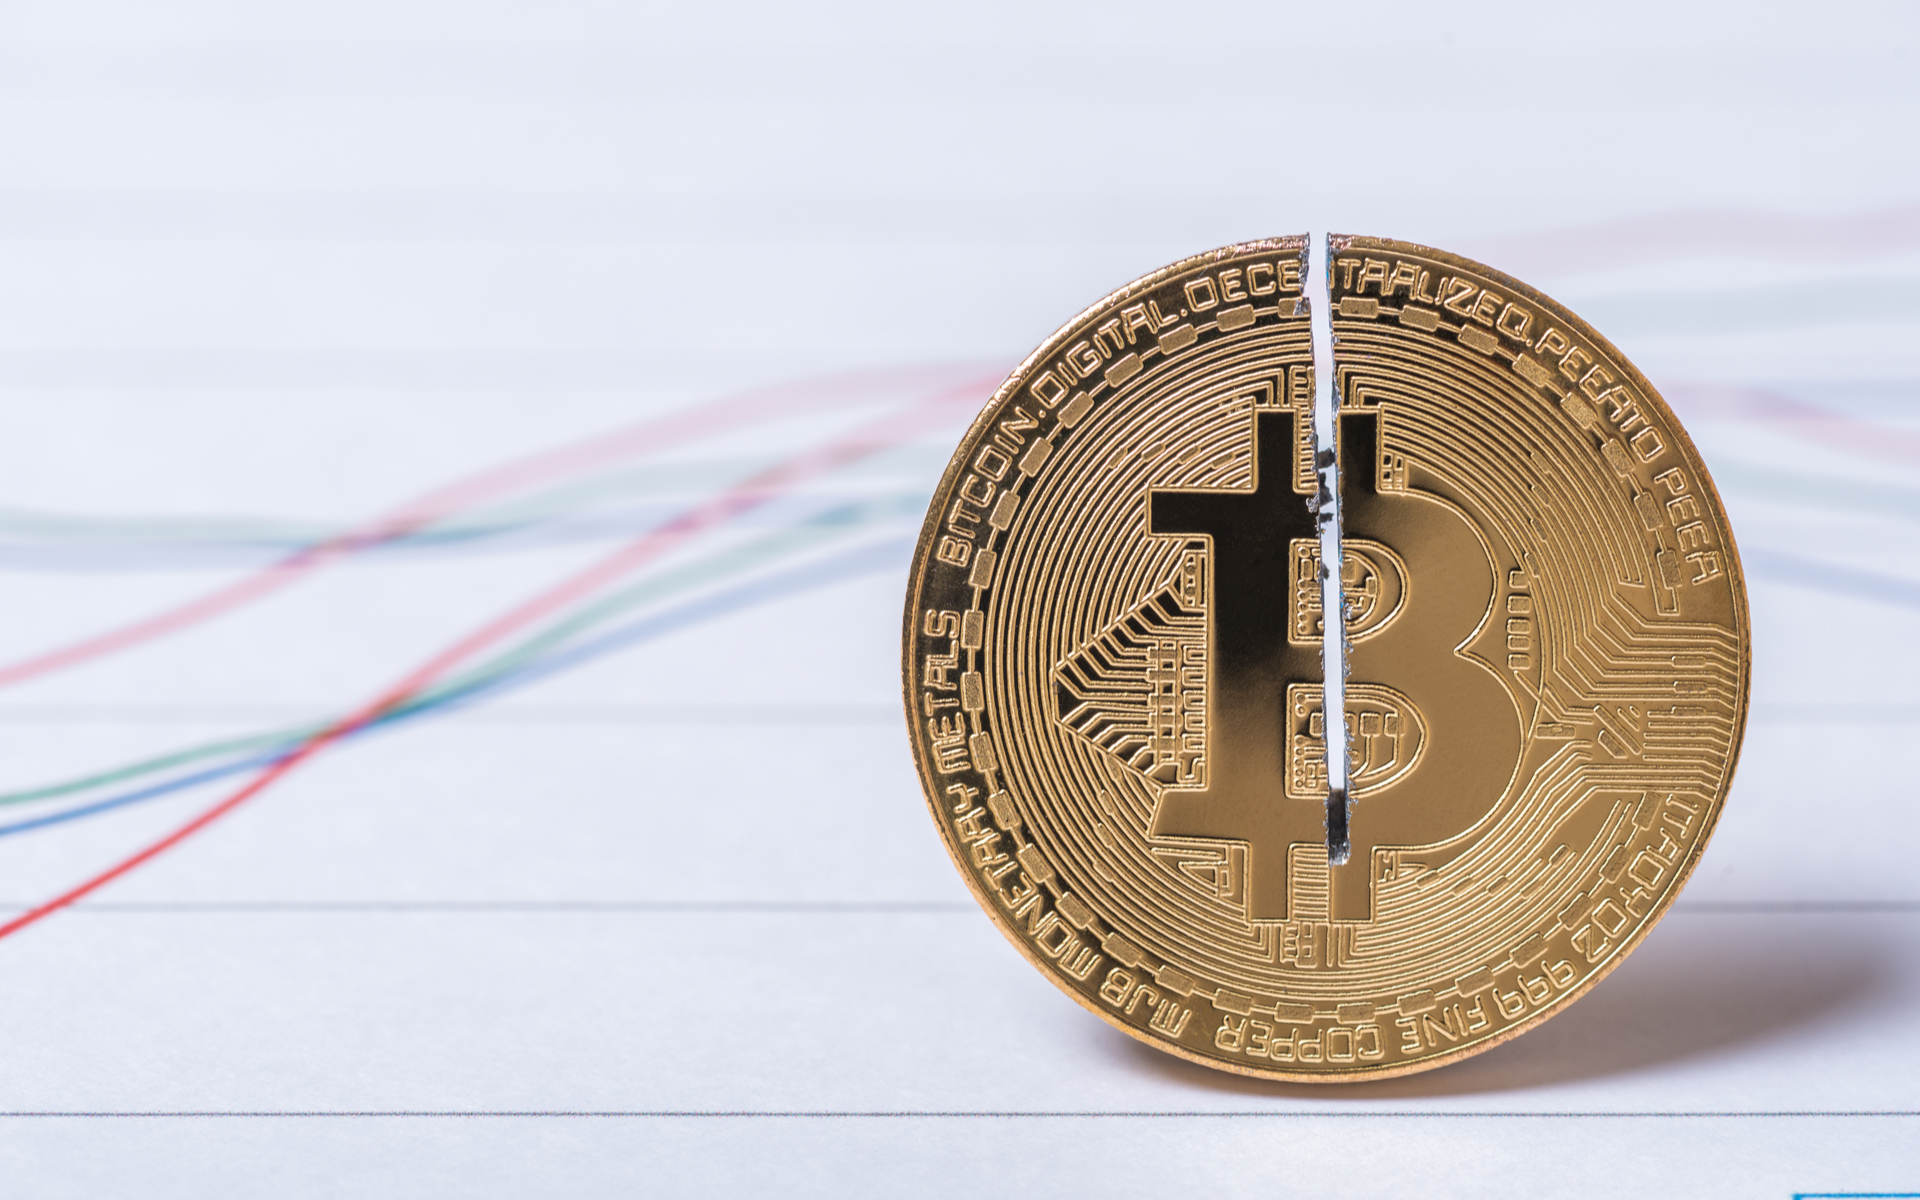 bitcoin yarilanmasinin fiyata etkisi ne